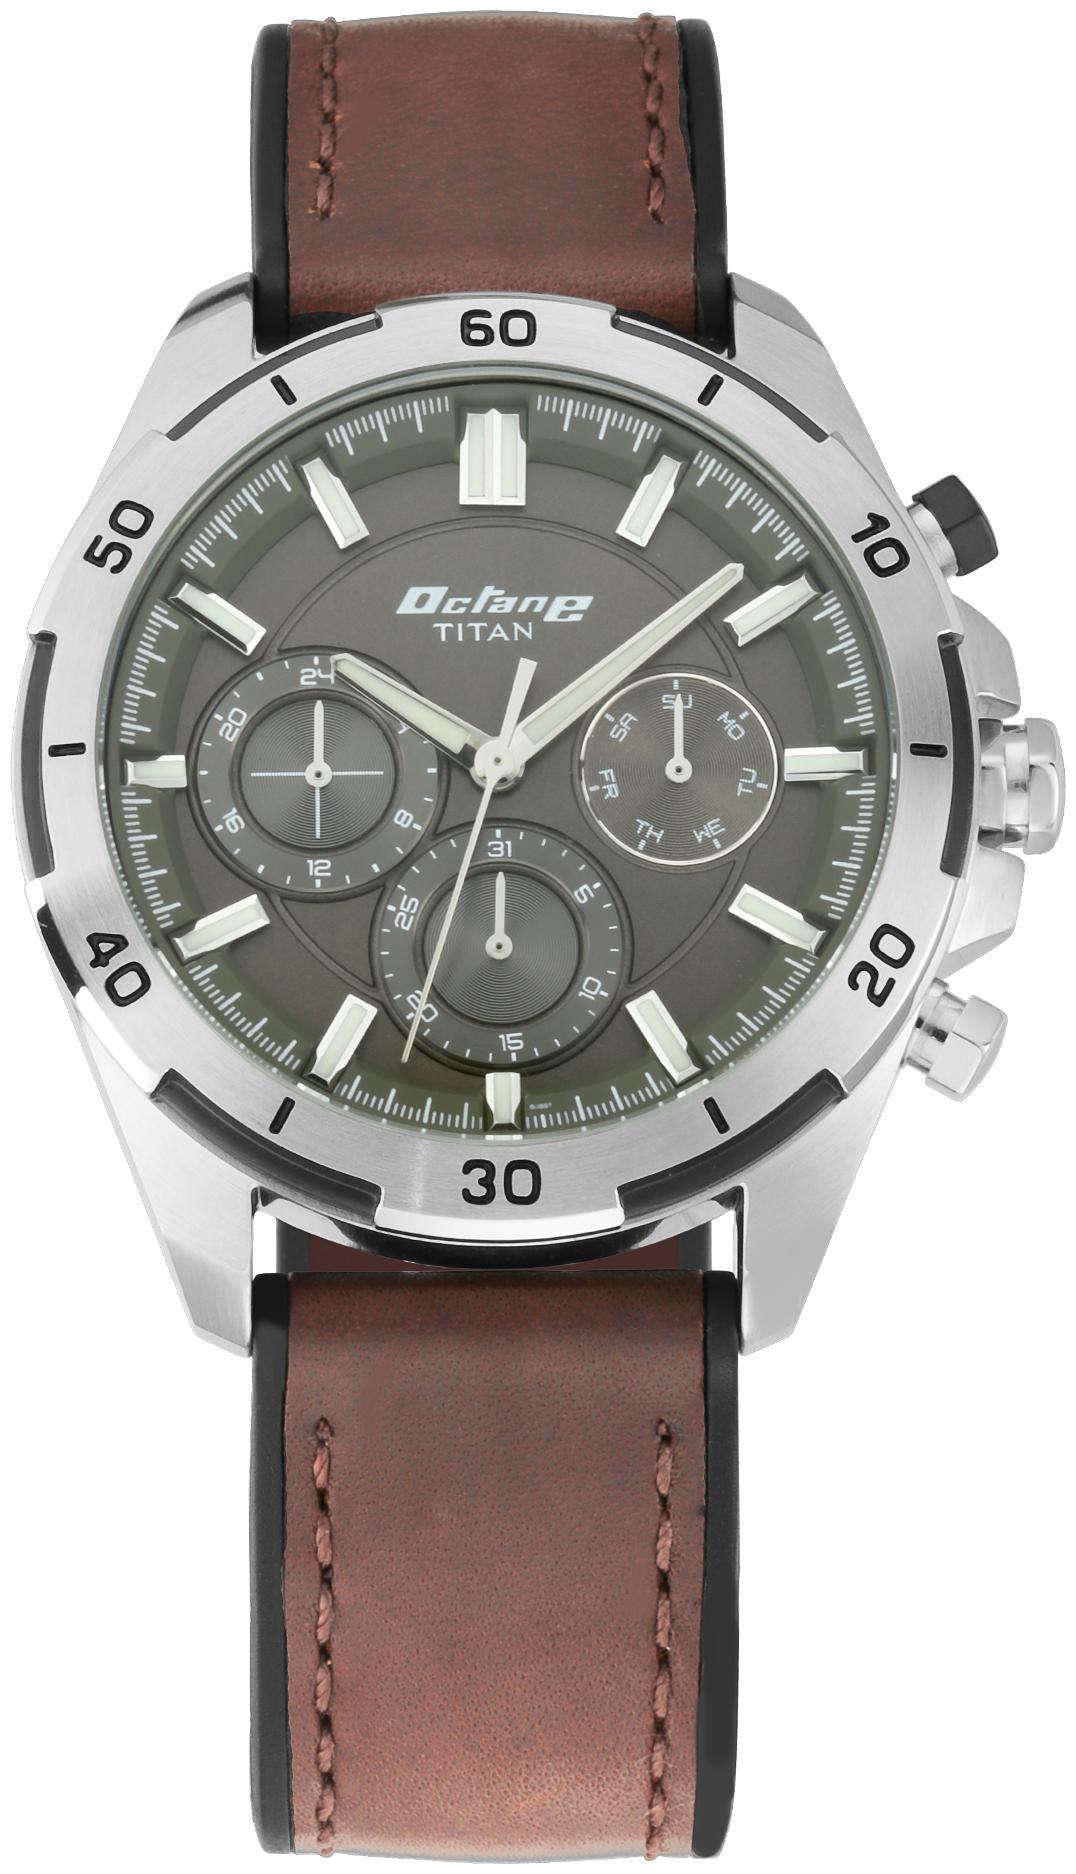 Titan Octane Hyper Lume 90114KP01 Analog Watch For Men by Titan Company